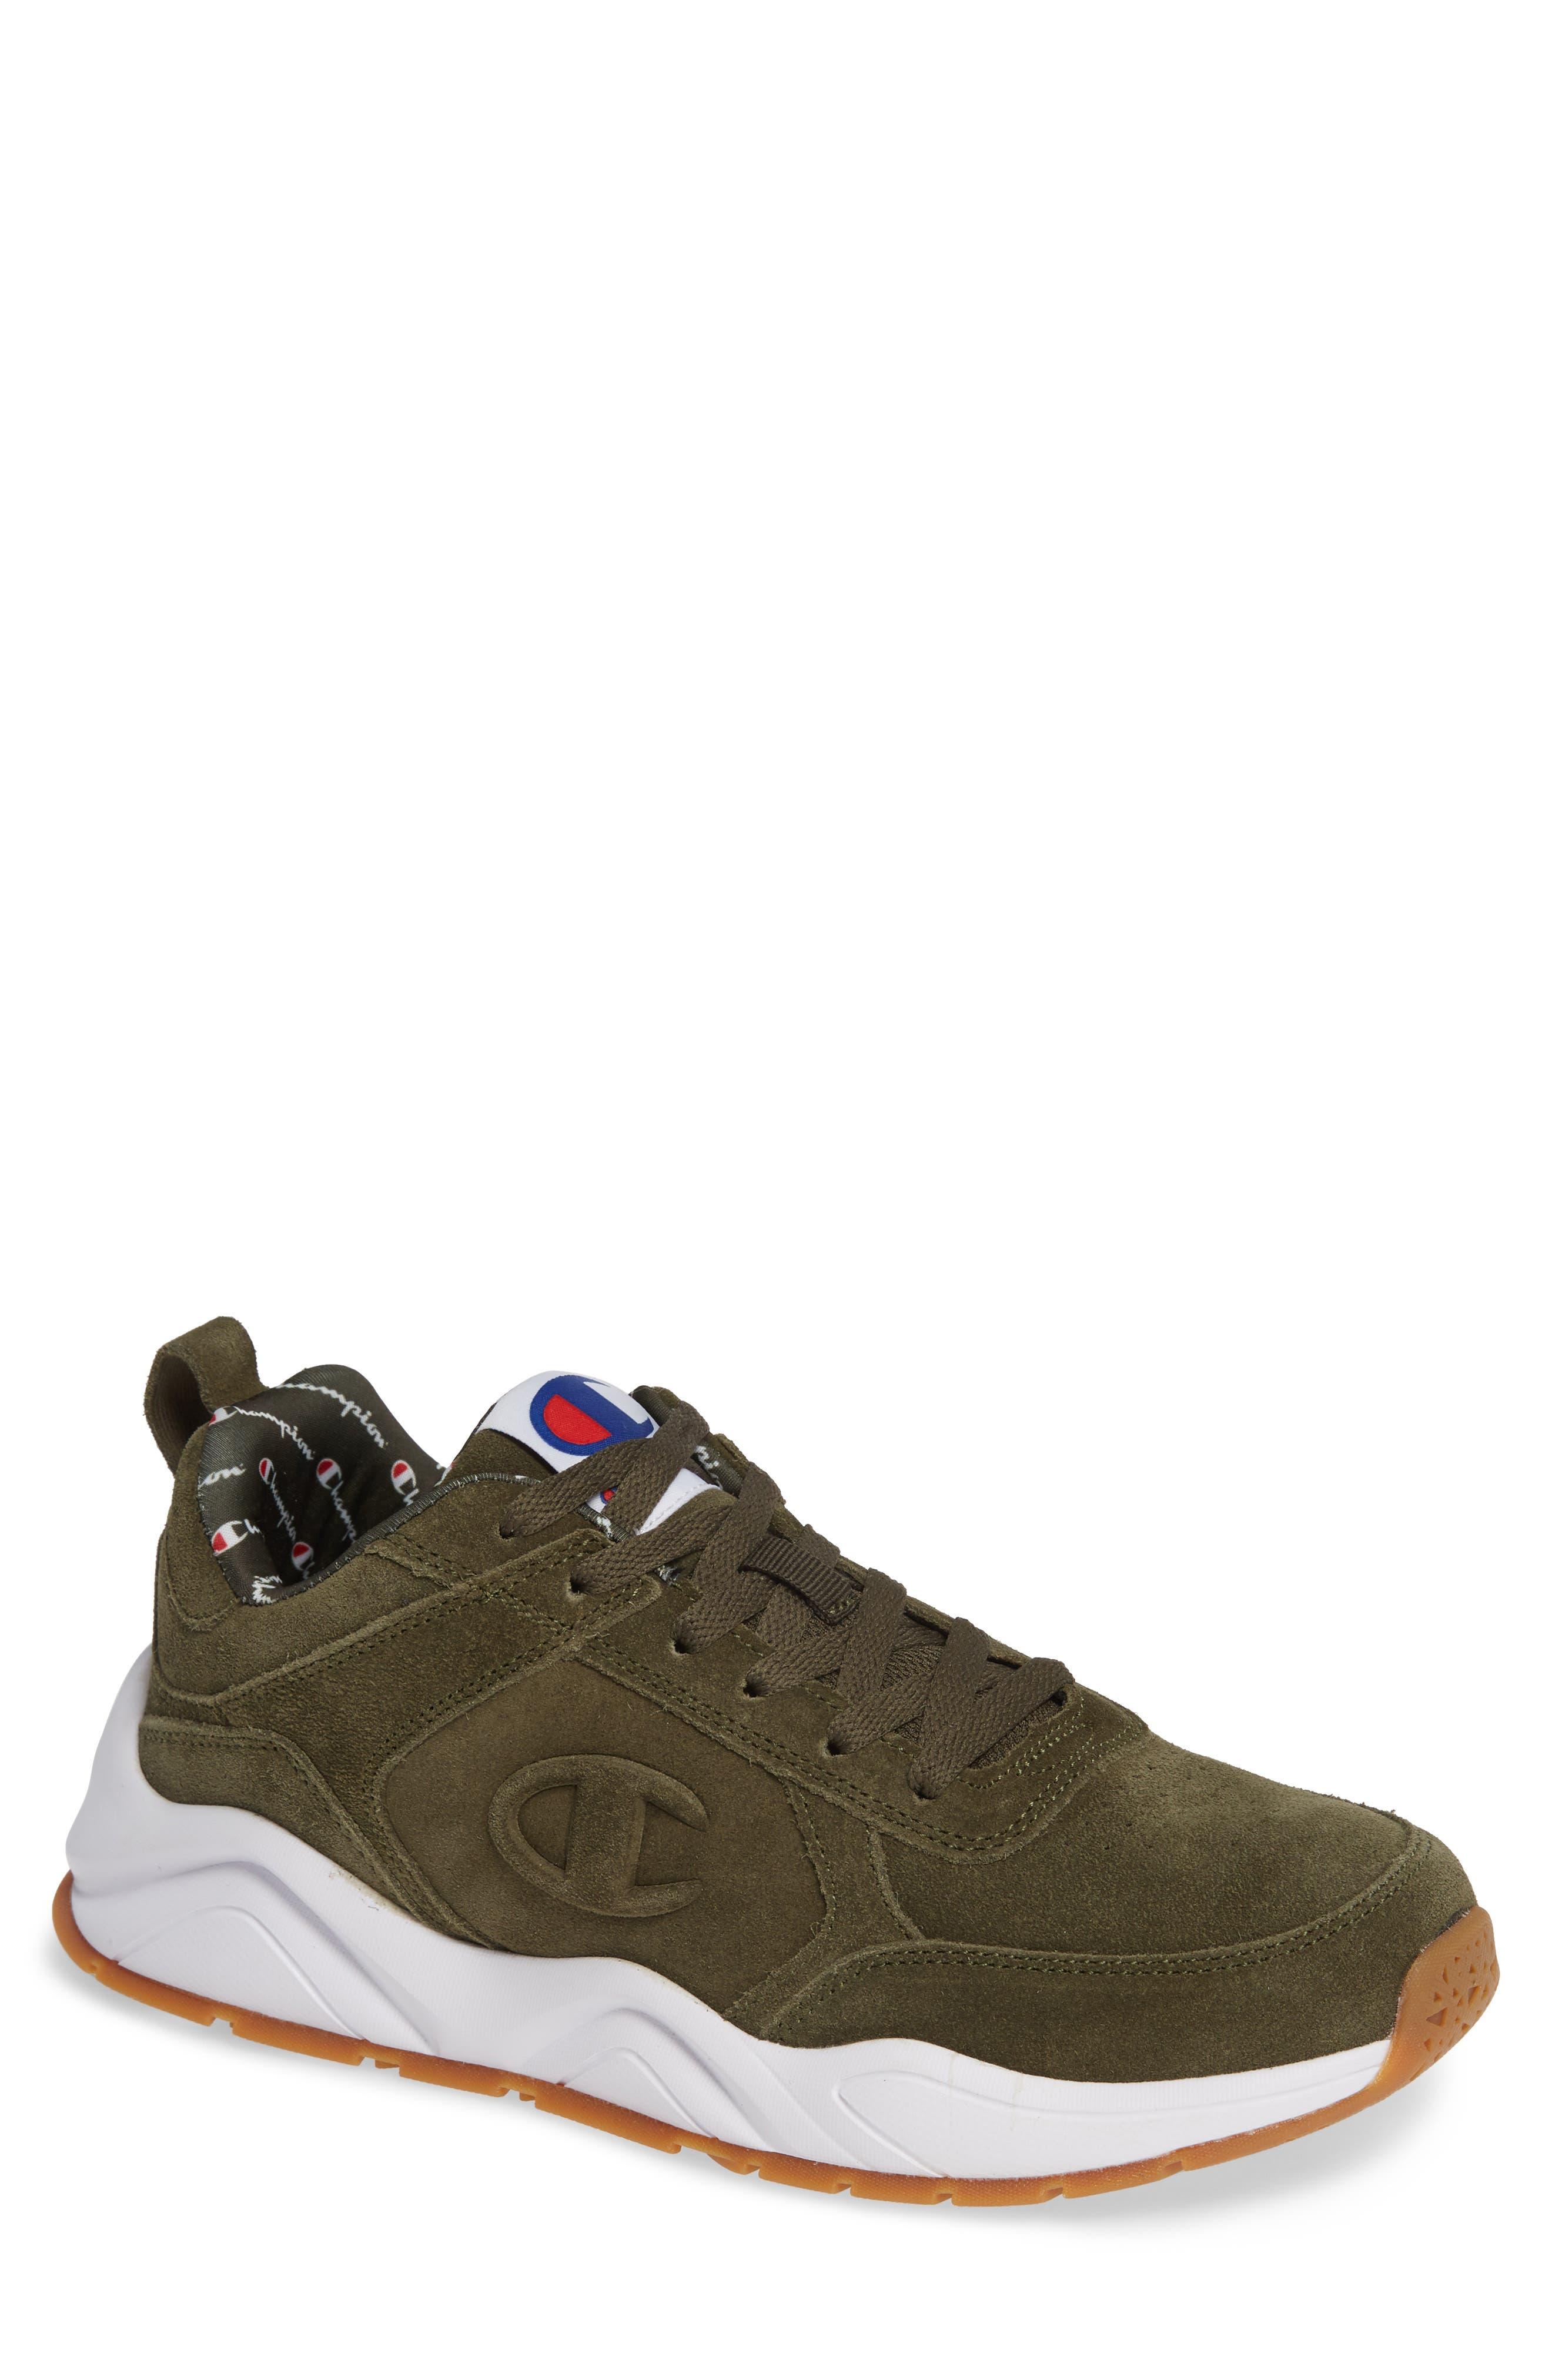 93Eighteen Sneaker,                             Main thumbnail 1, color,                             HIKER GREEN SUEDE